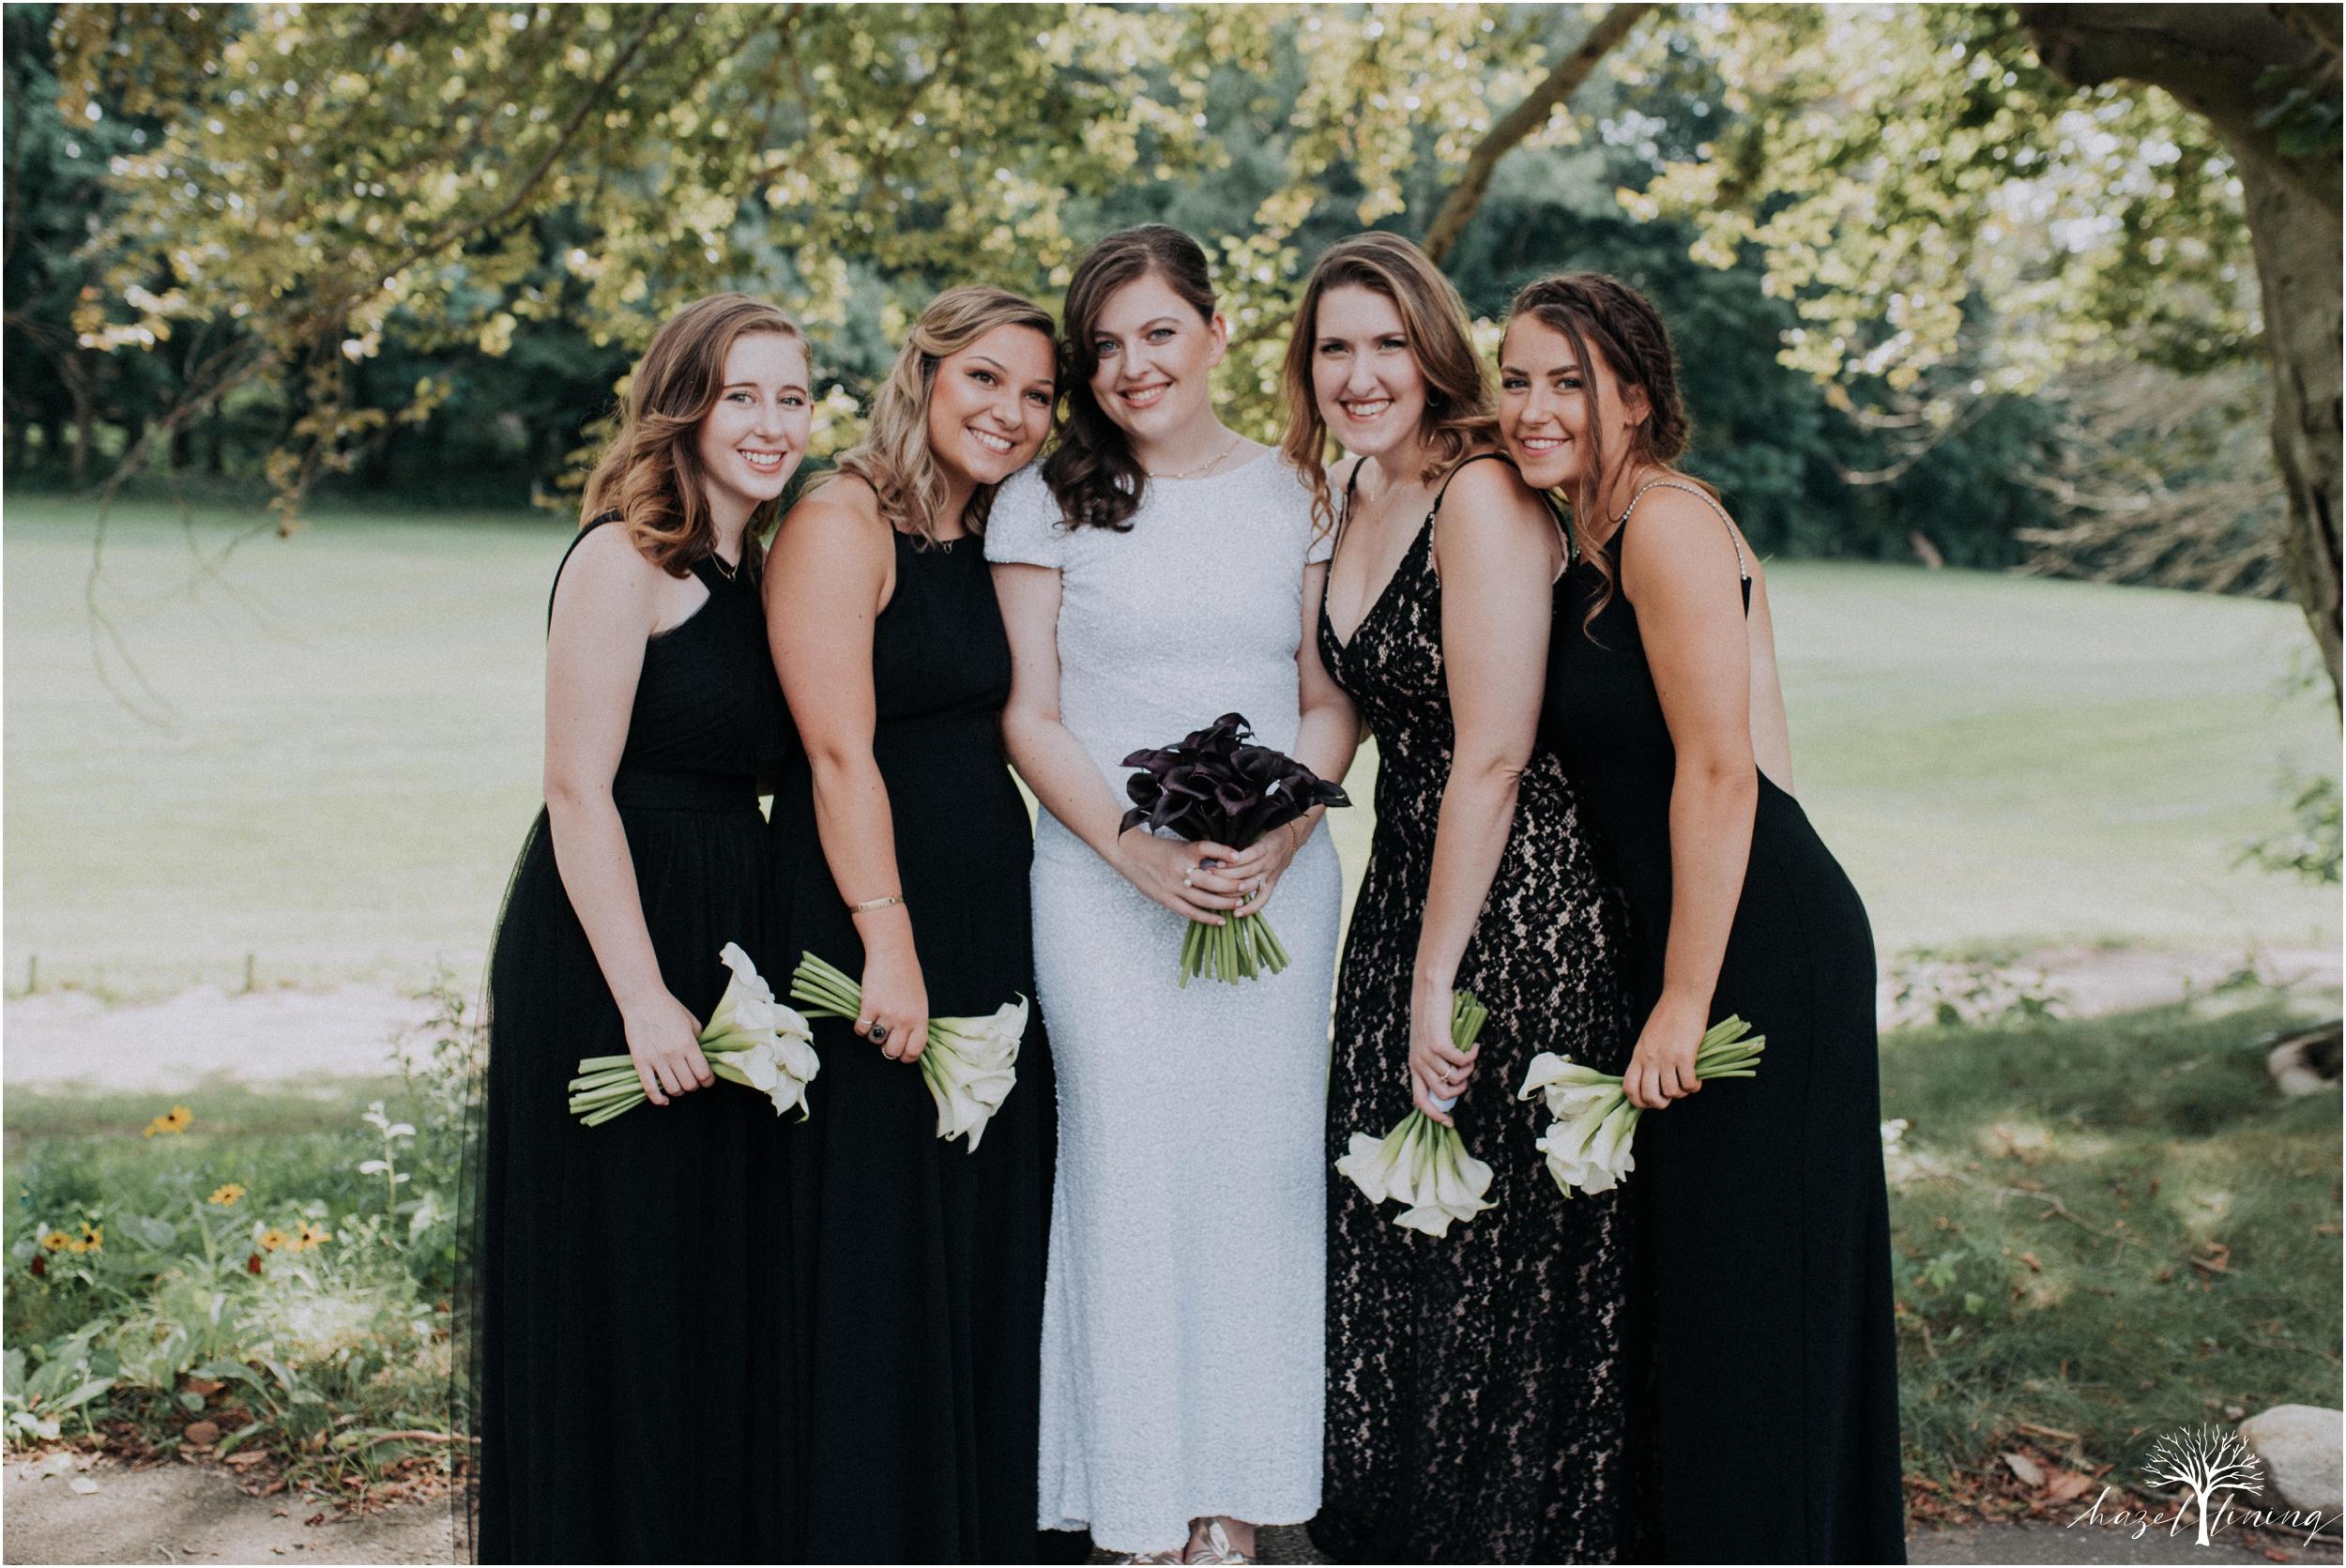 elizabeth-doelp-andrew-foreback-middletown-country-club-summer-langhorne-pennsylvania-wedding-hazel-lining-travel-wedding-elopement-photography_0053.jpg